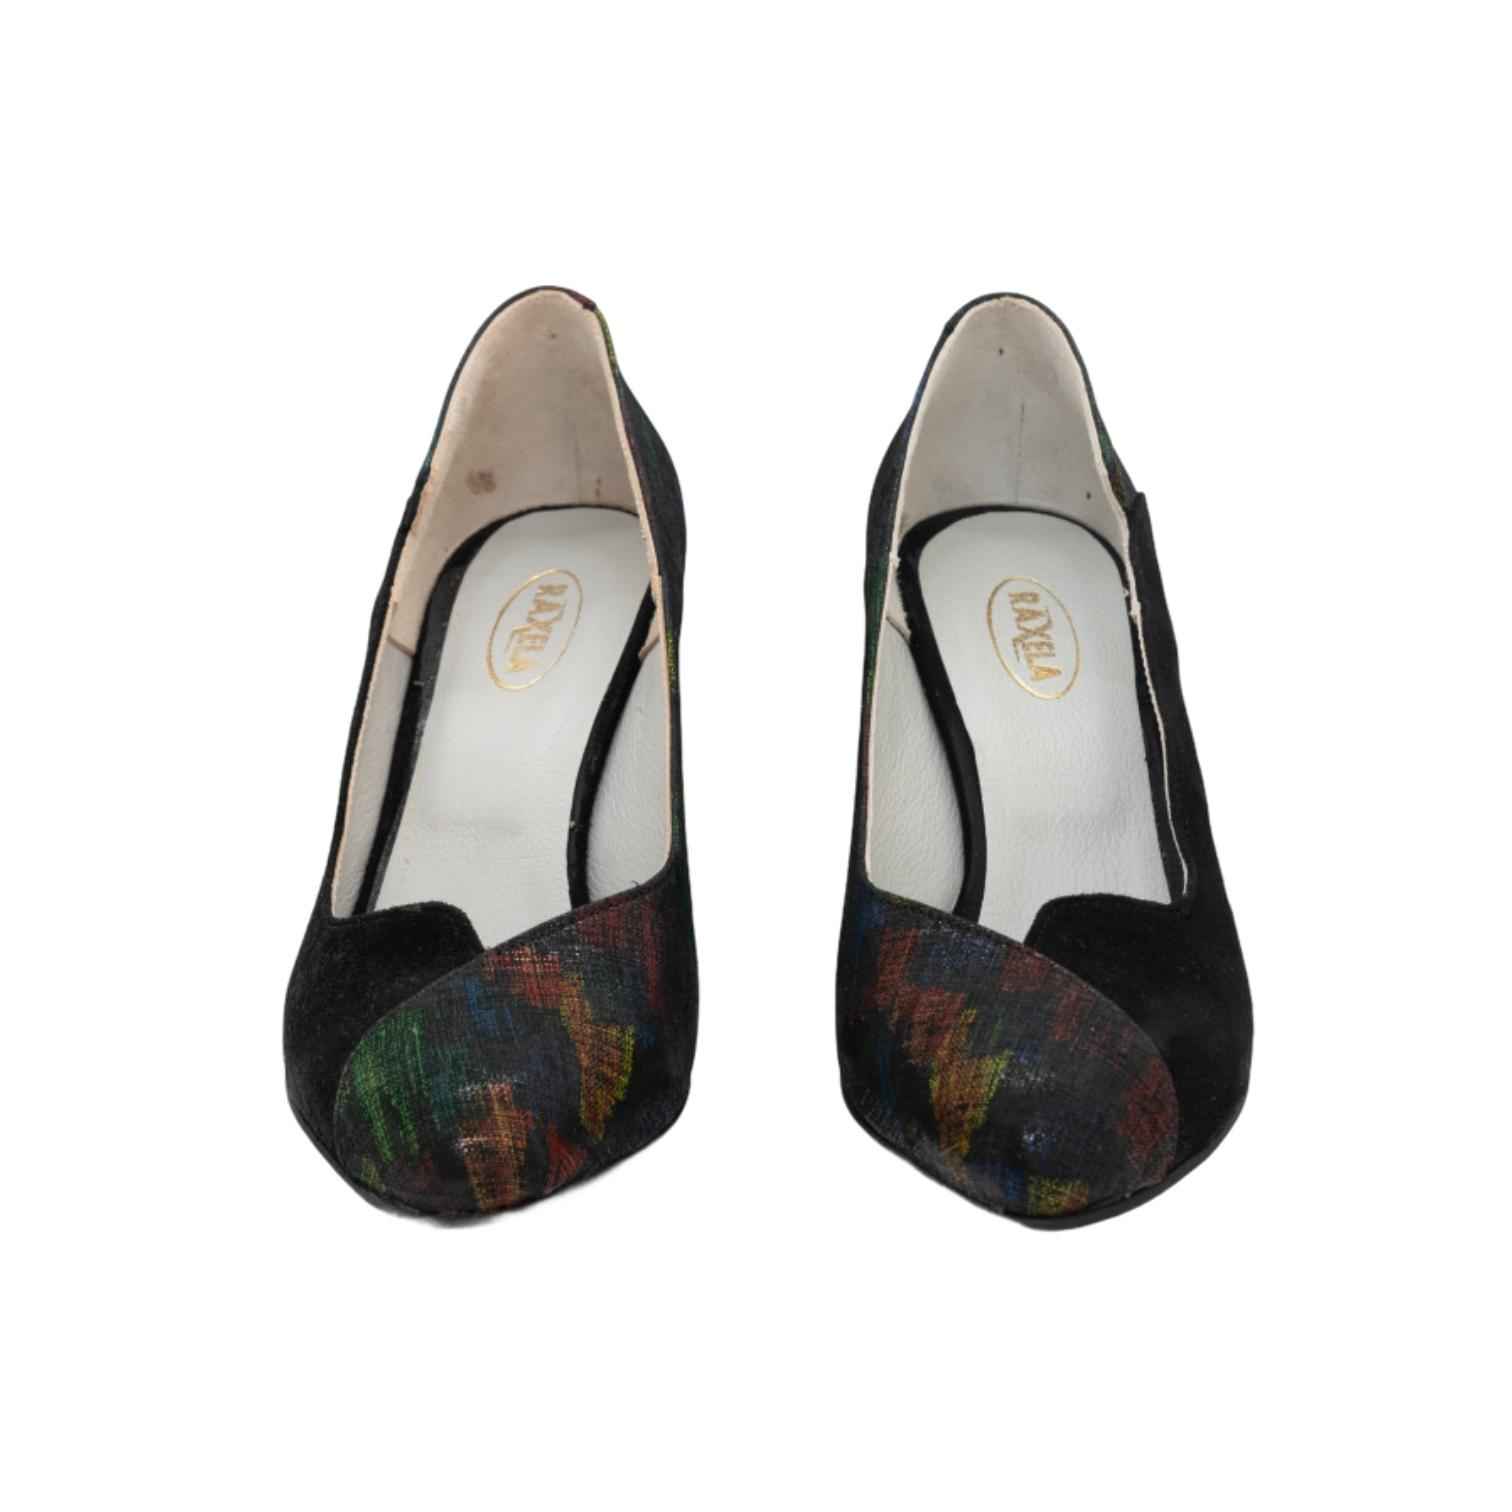 Pantofi negri cu model abstract